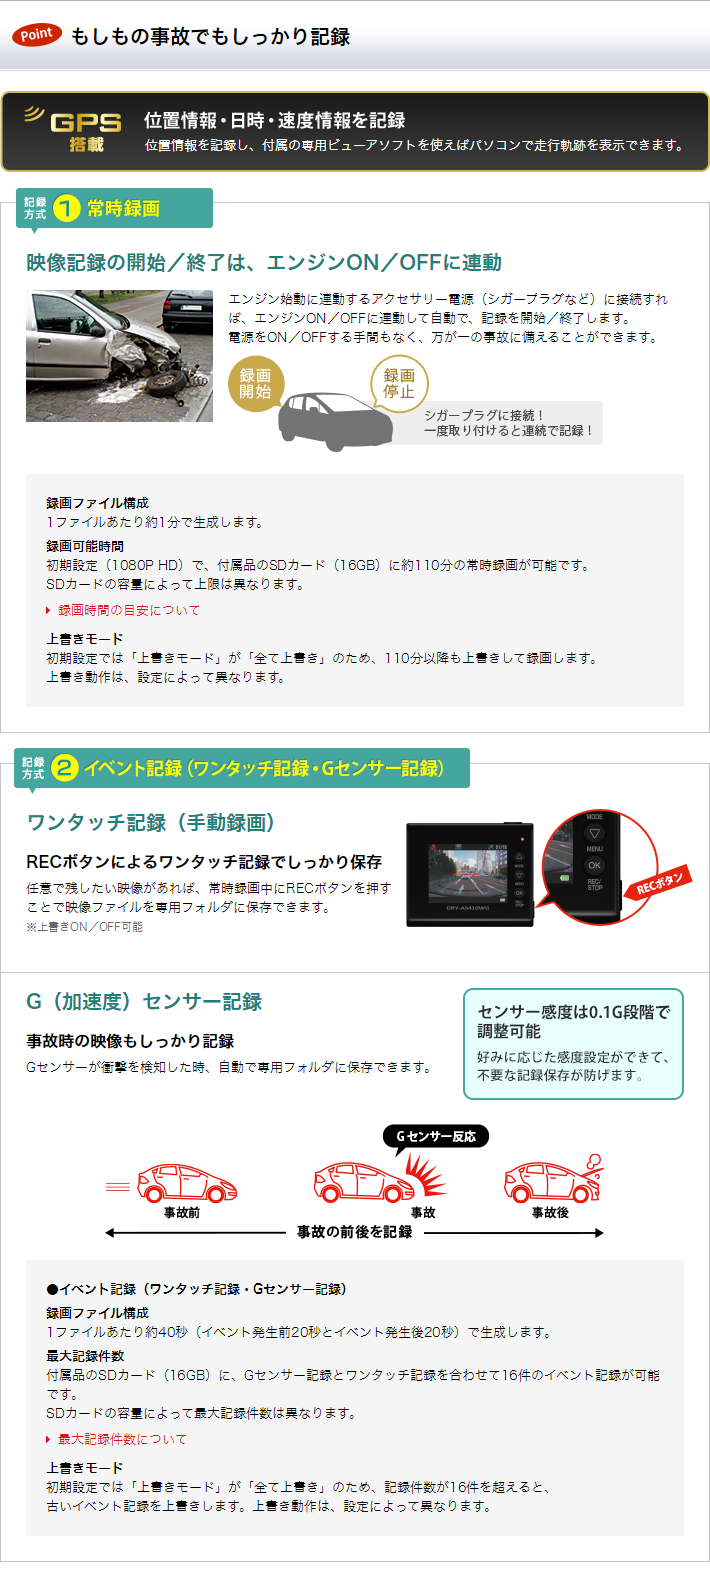 Full HD ドライブレコーダー dry-as410wgc